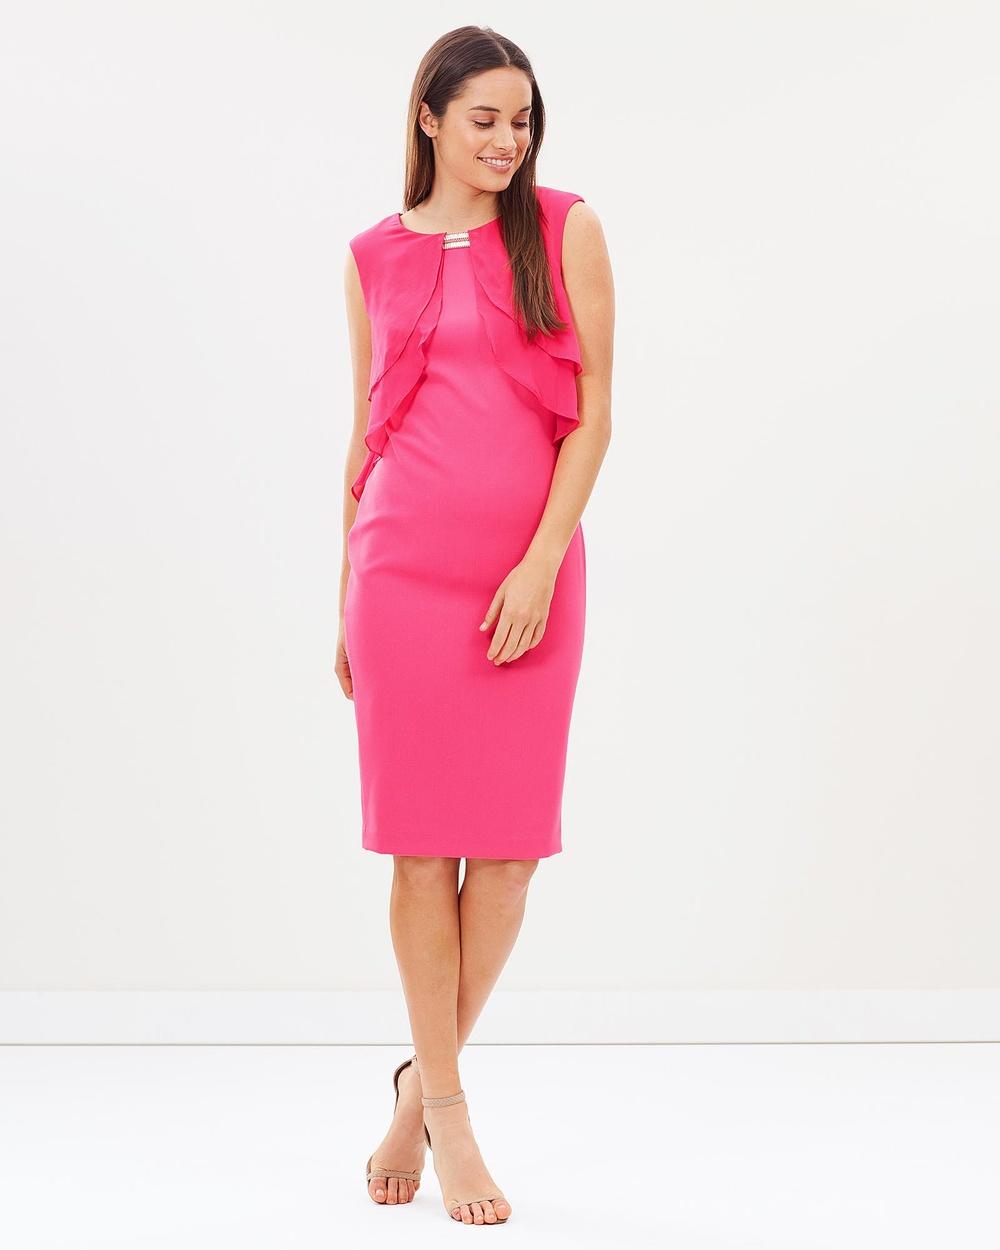 Pink Ruby Bella Dress Dresses Pink Bella Dress